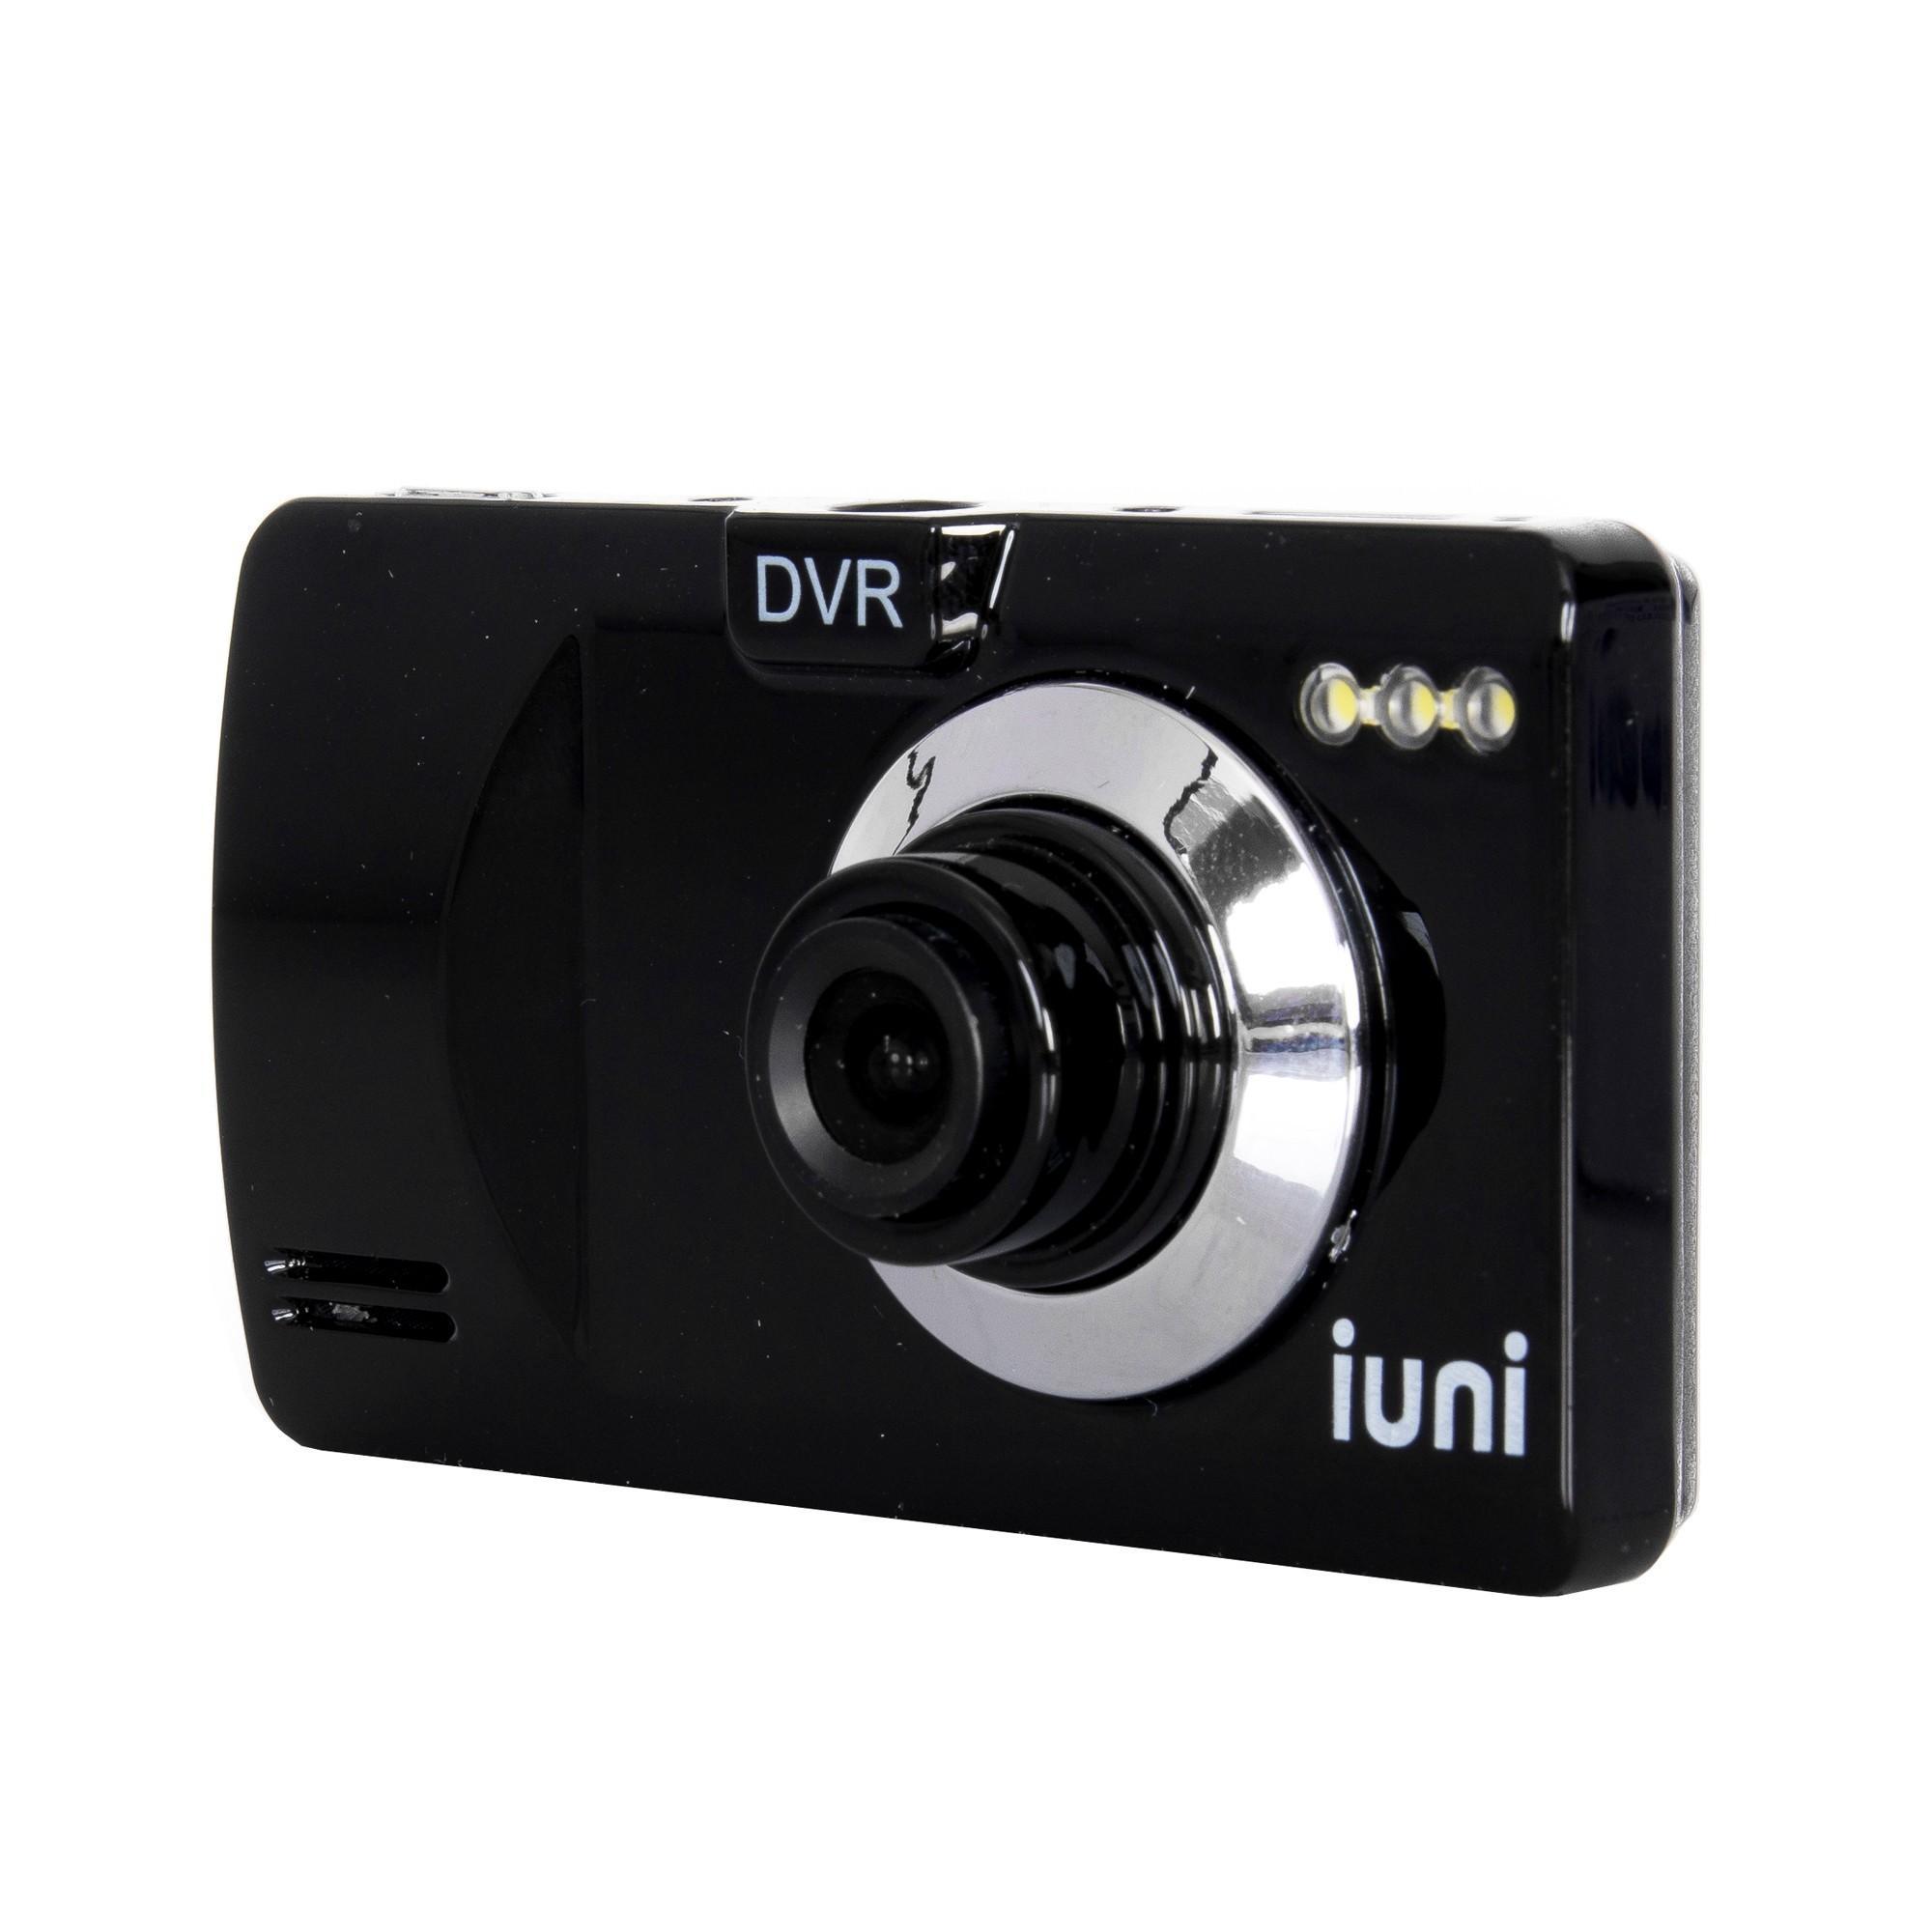 Camera auto DVR iUni Dash P818, HD, LCD 2,5 inch, Unghi de filmare 120 grade, Playback